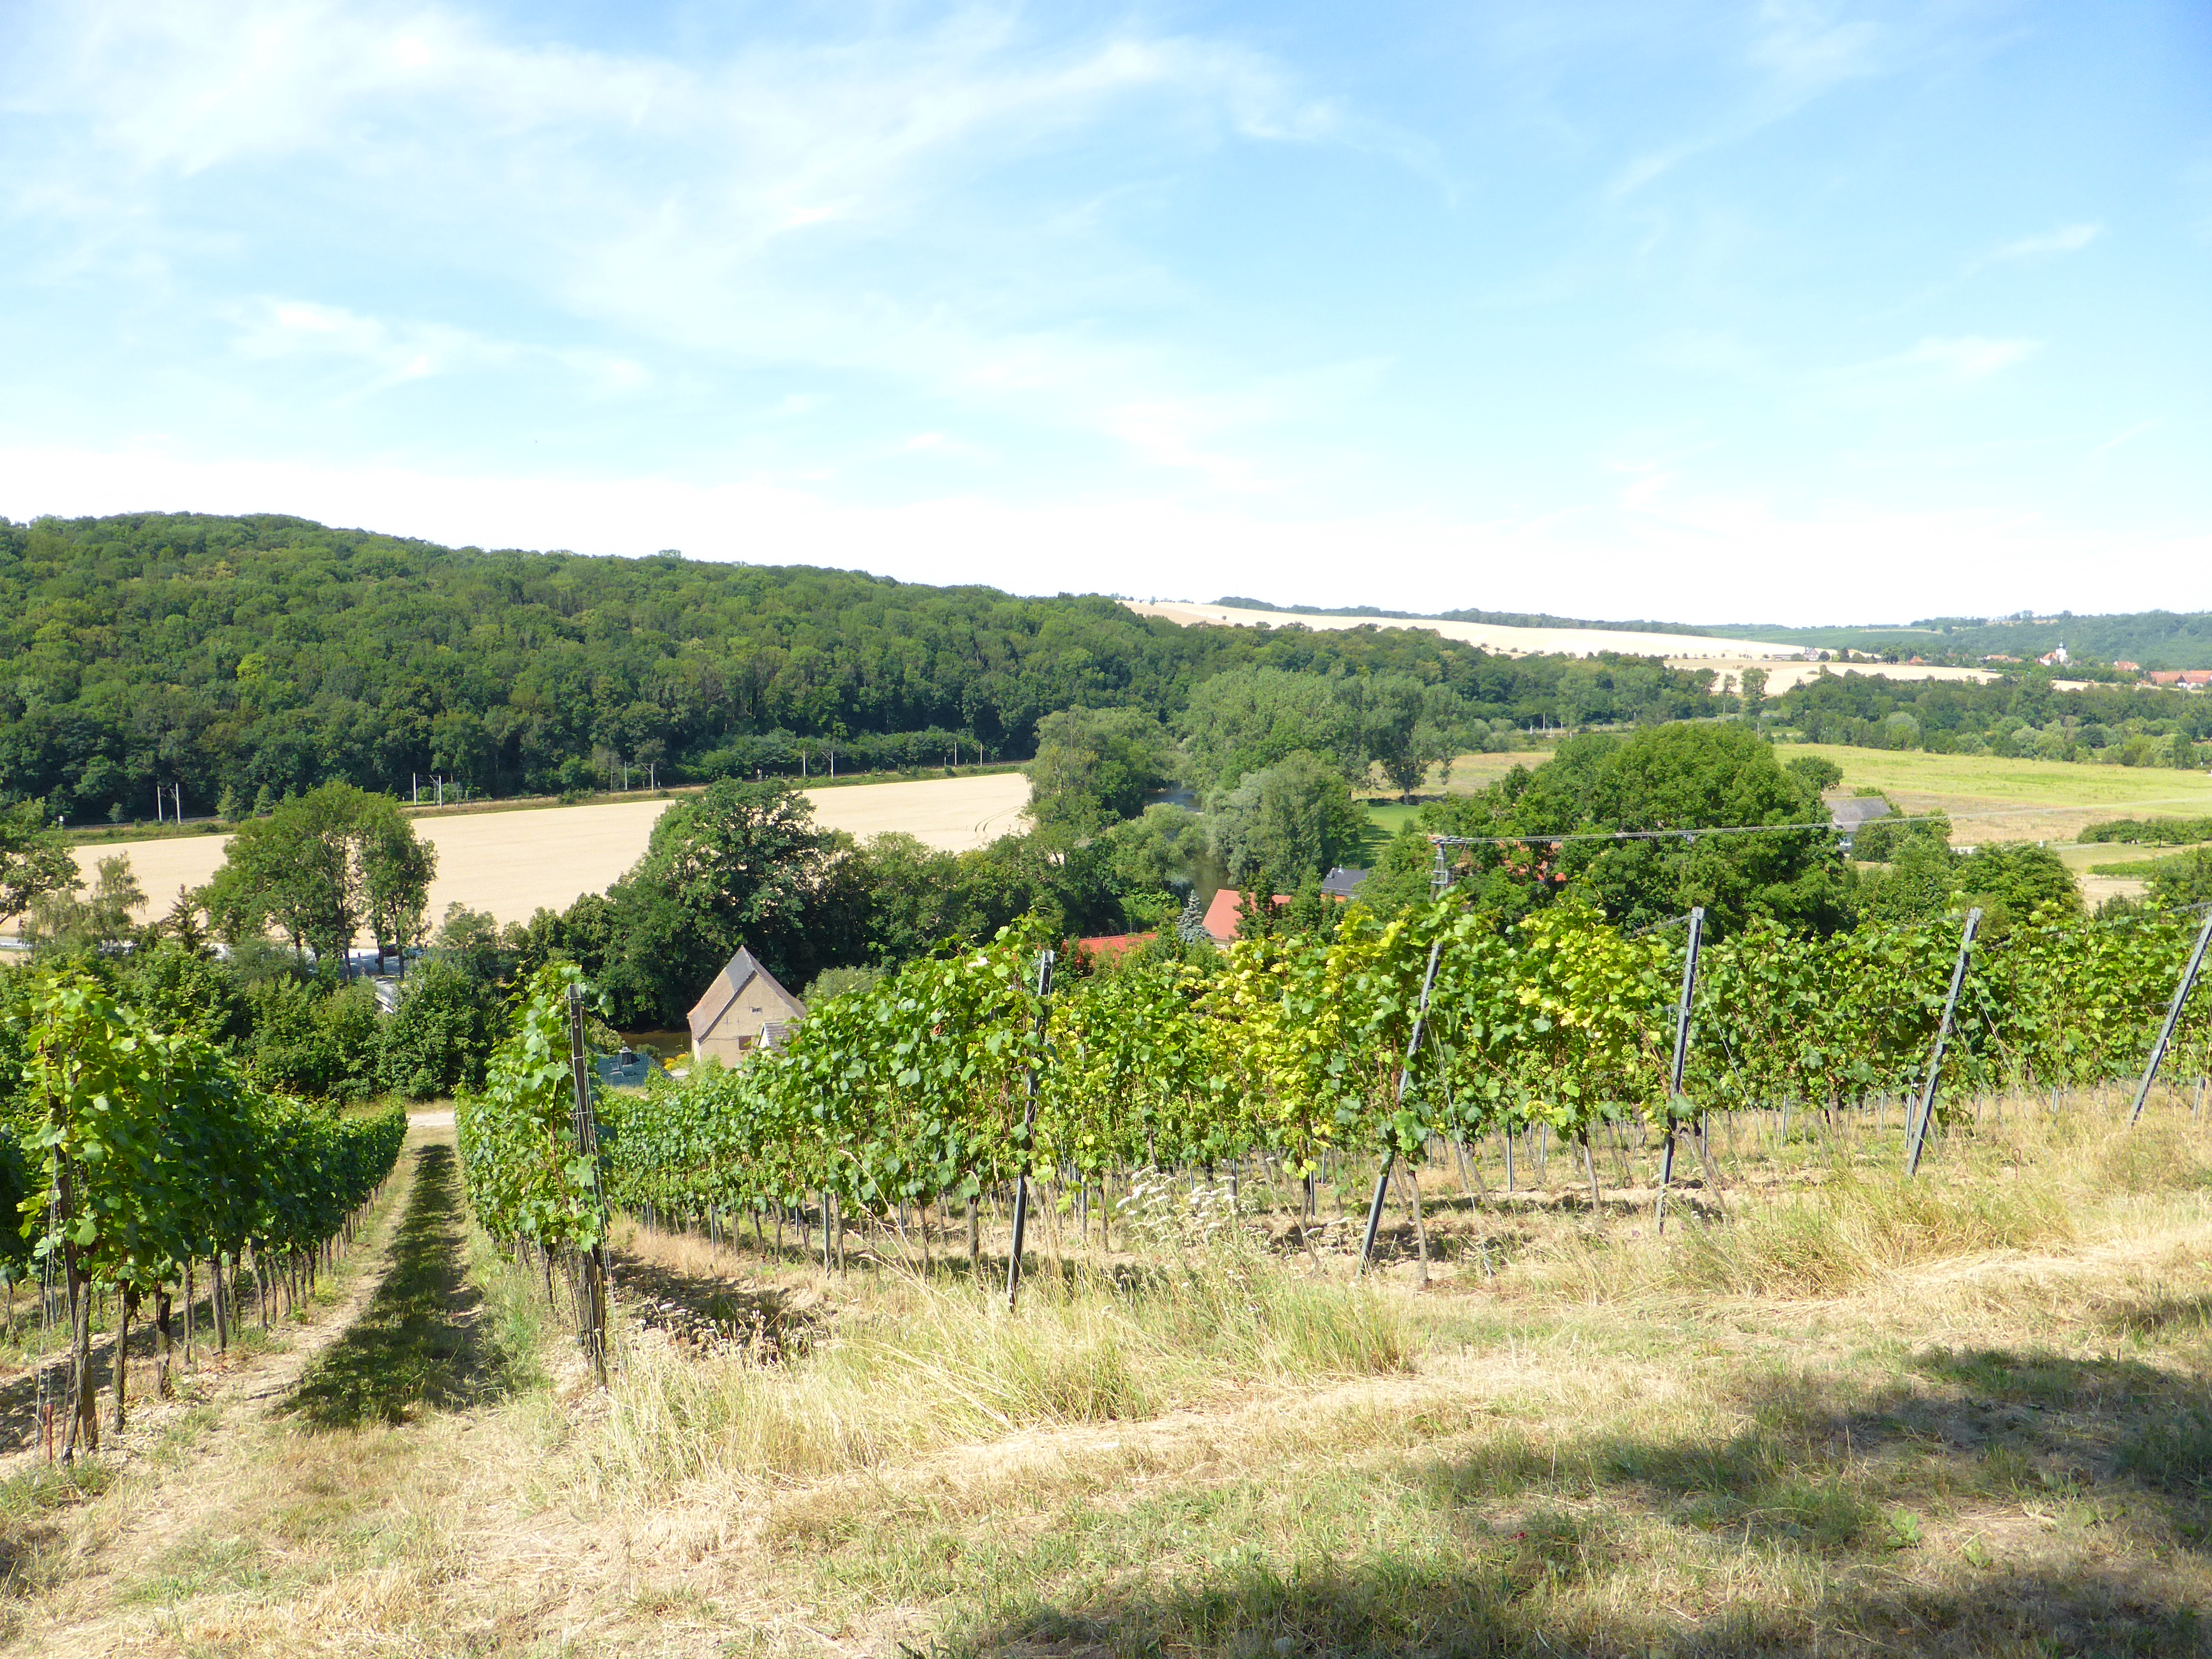 Weingut Zahn (RAG Weimarer Land - Mittelthüringen e.V.)